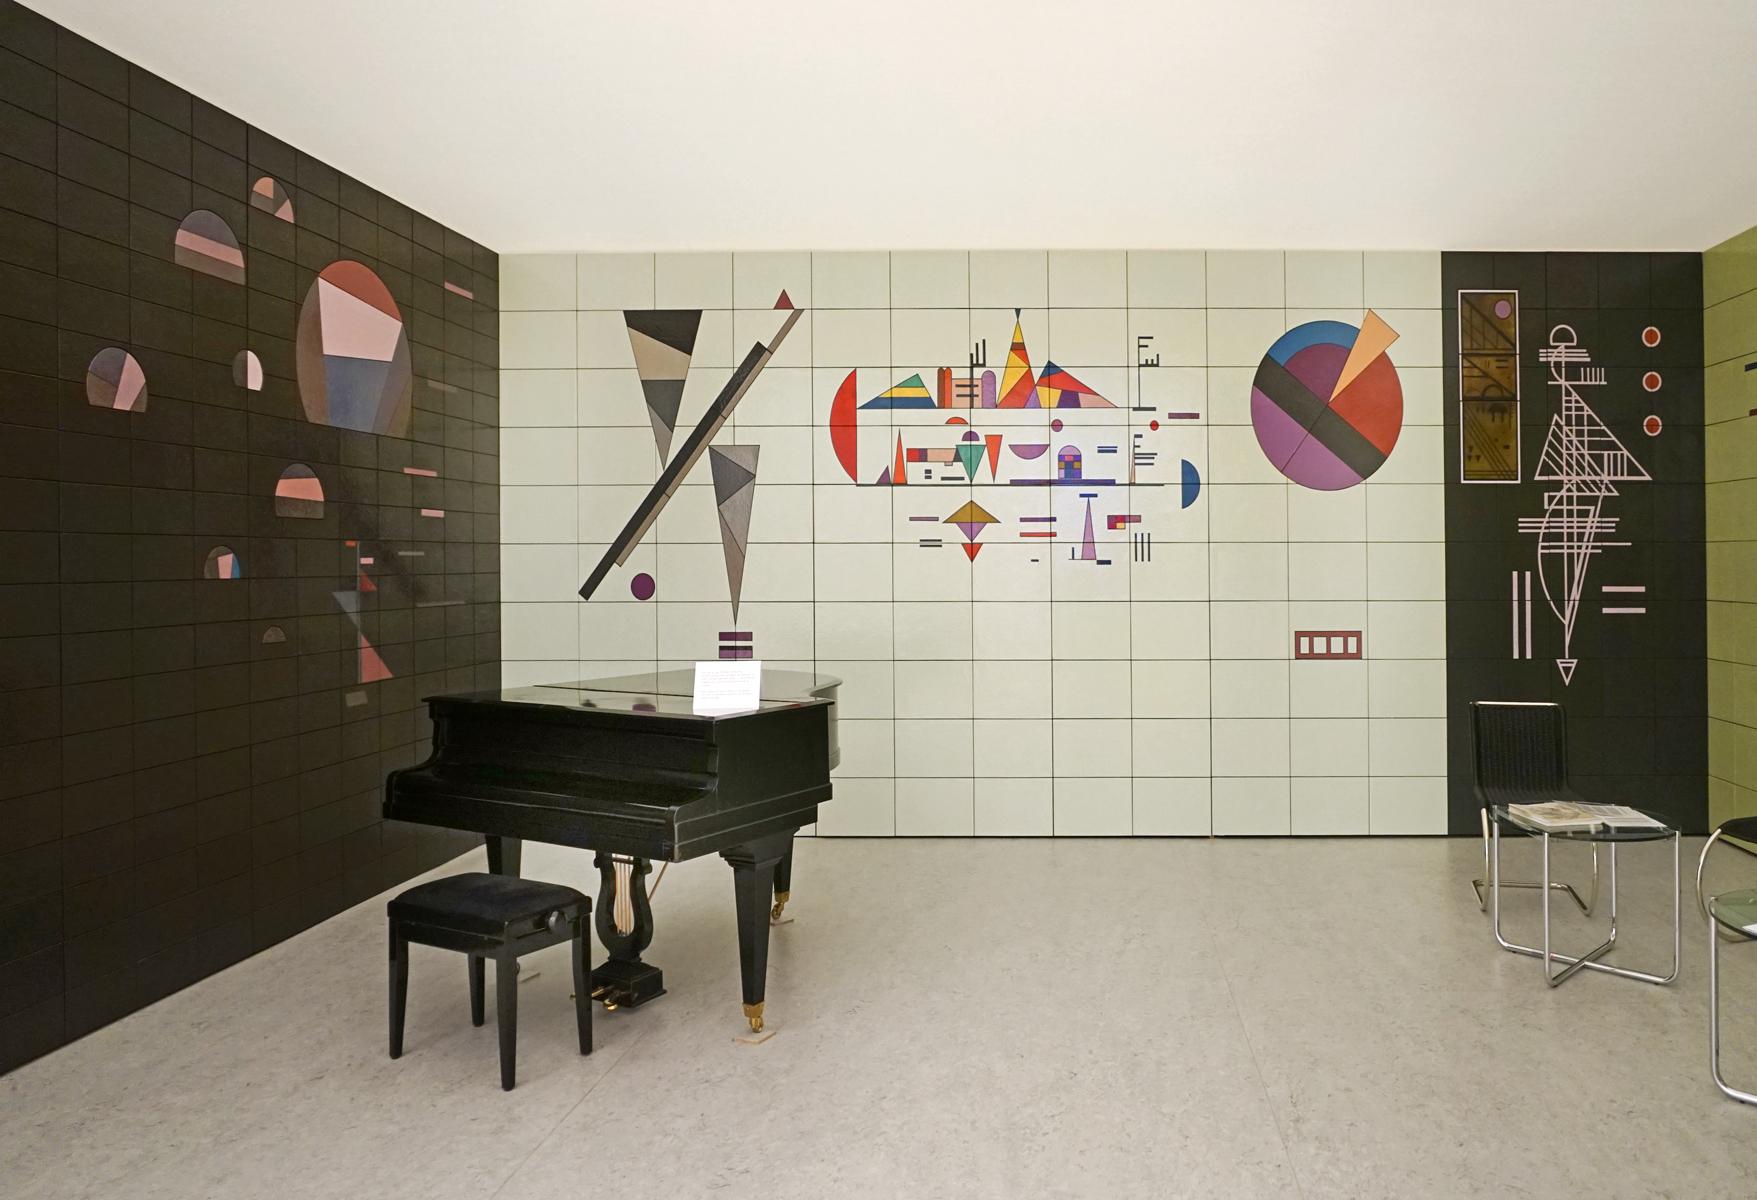 File le salon de musique de v kandinsky mamc strasbourg 28492530624 jpg wikimedia commons - Salon de la musique strasbourg ...